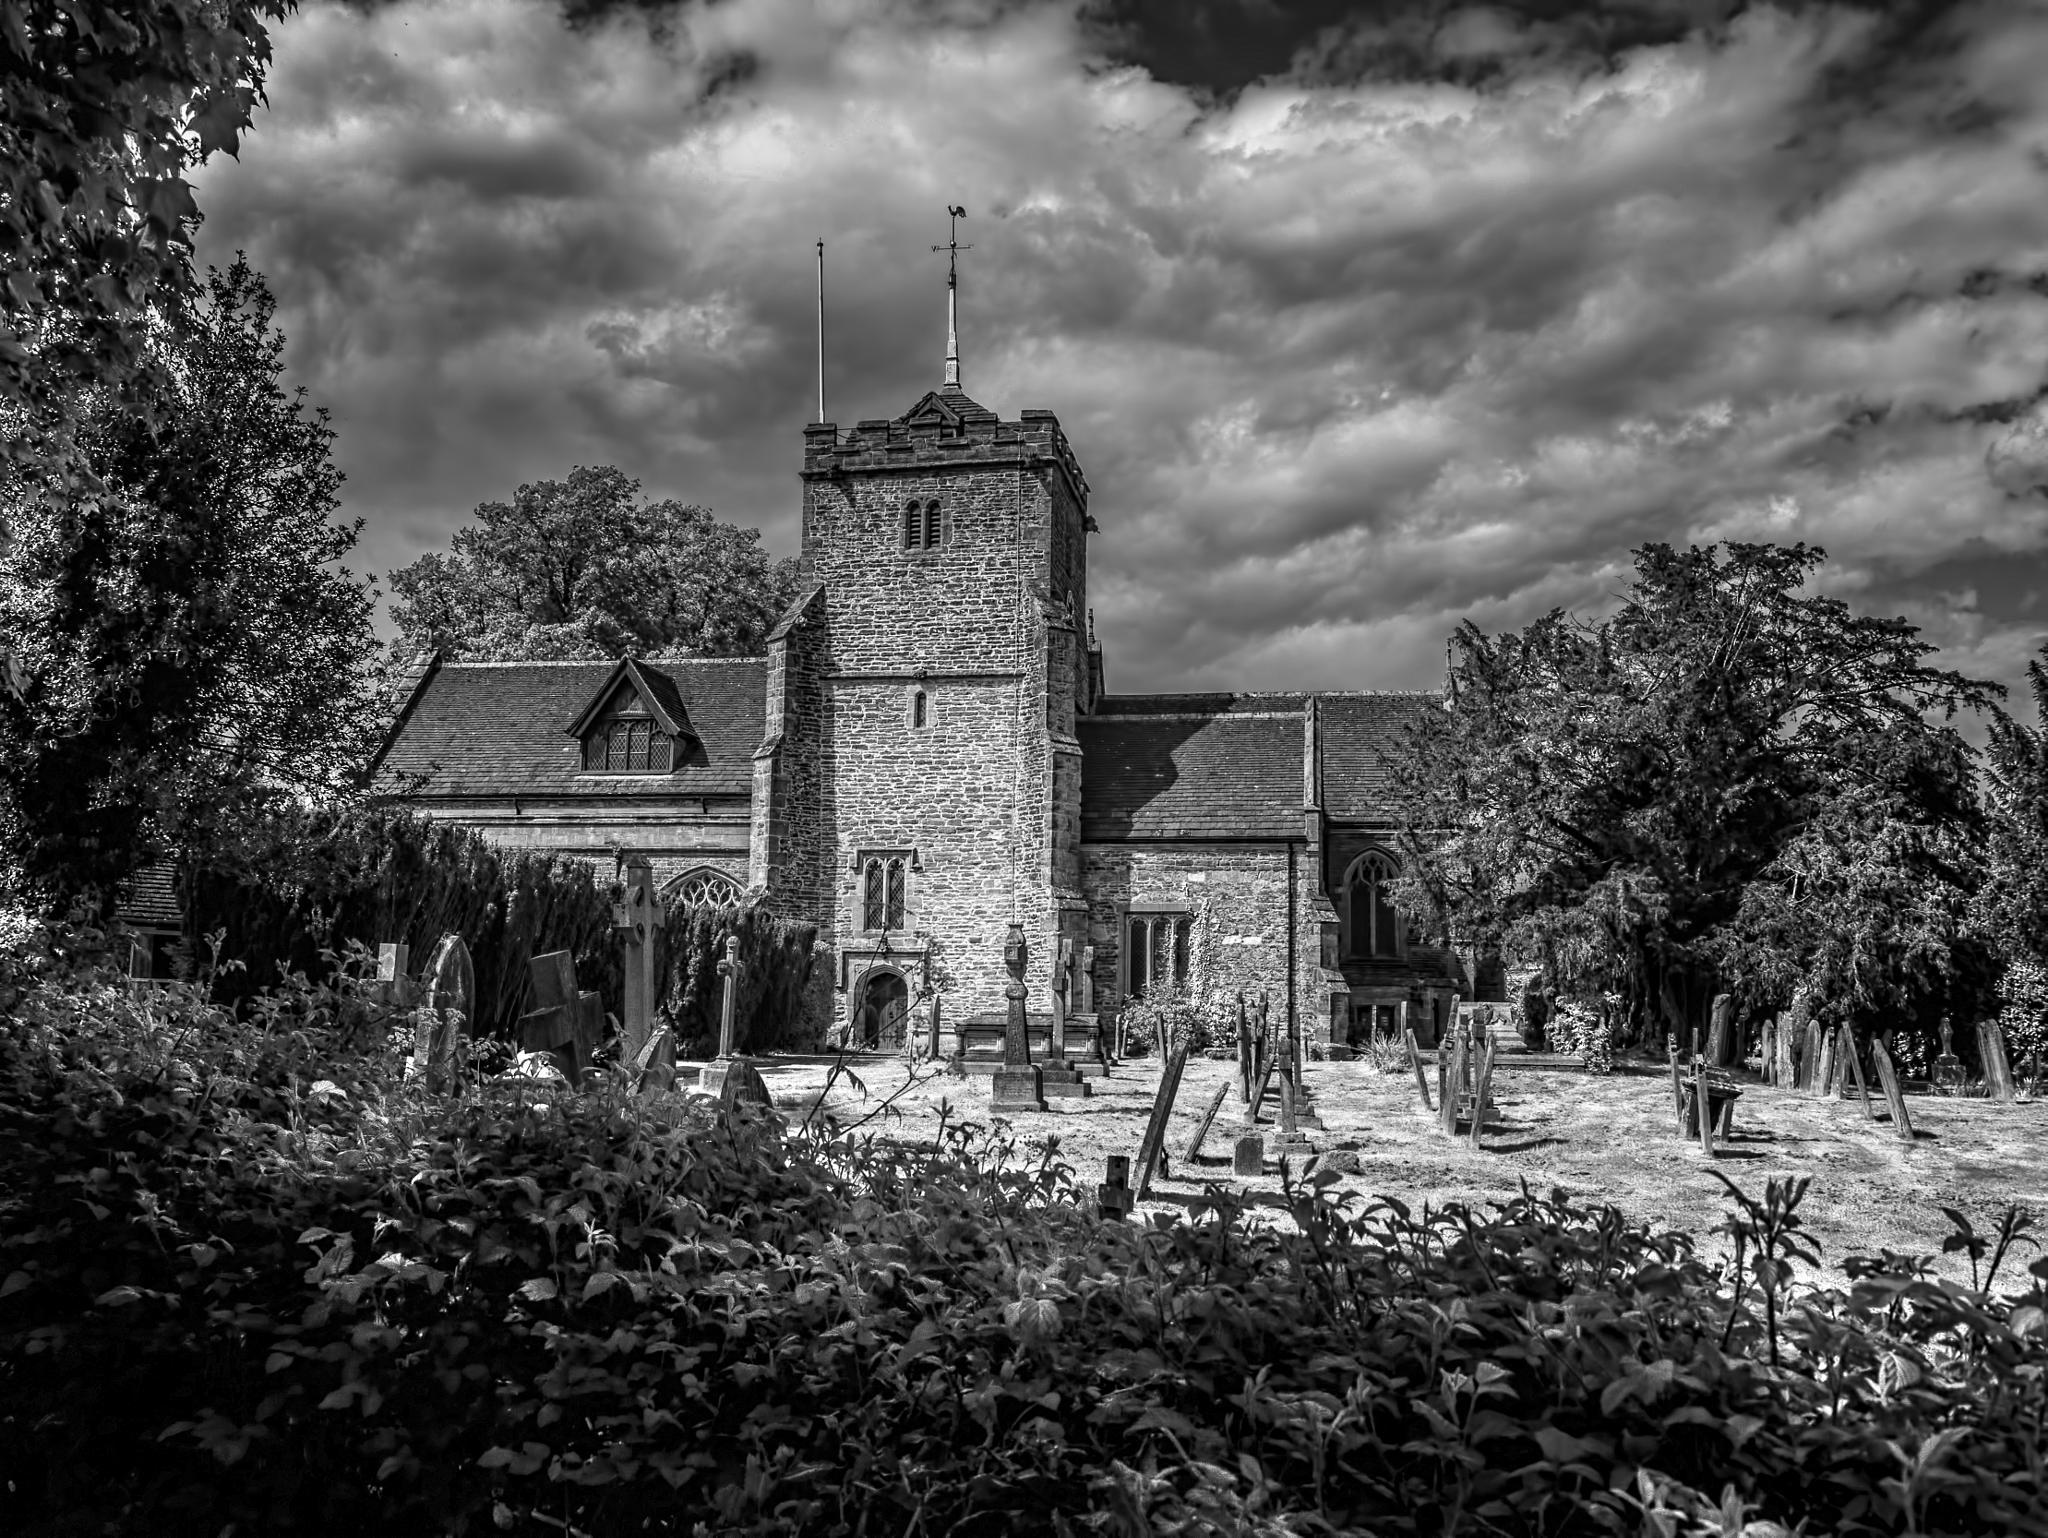 St Margaret's Church, Warnham by Alan Fife